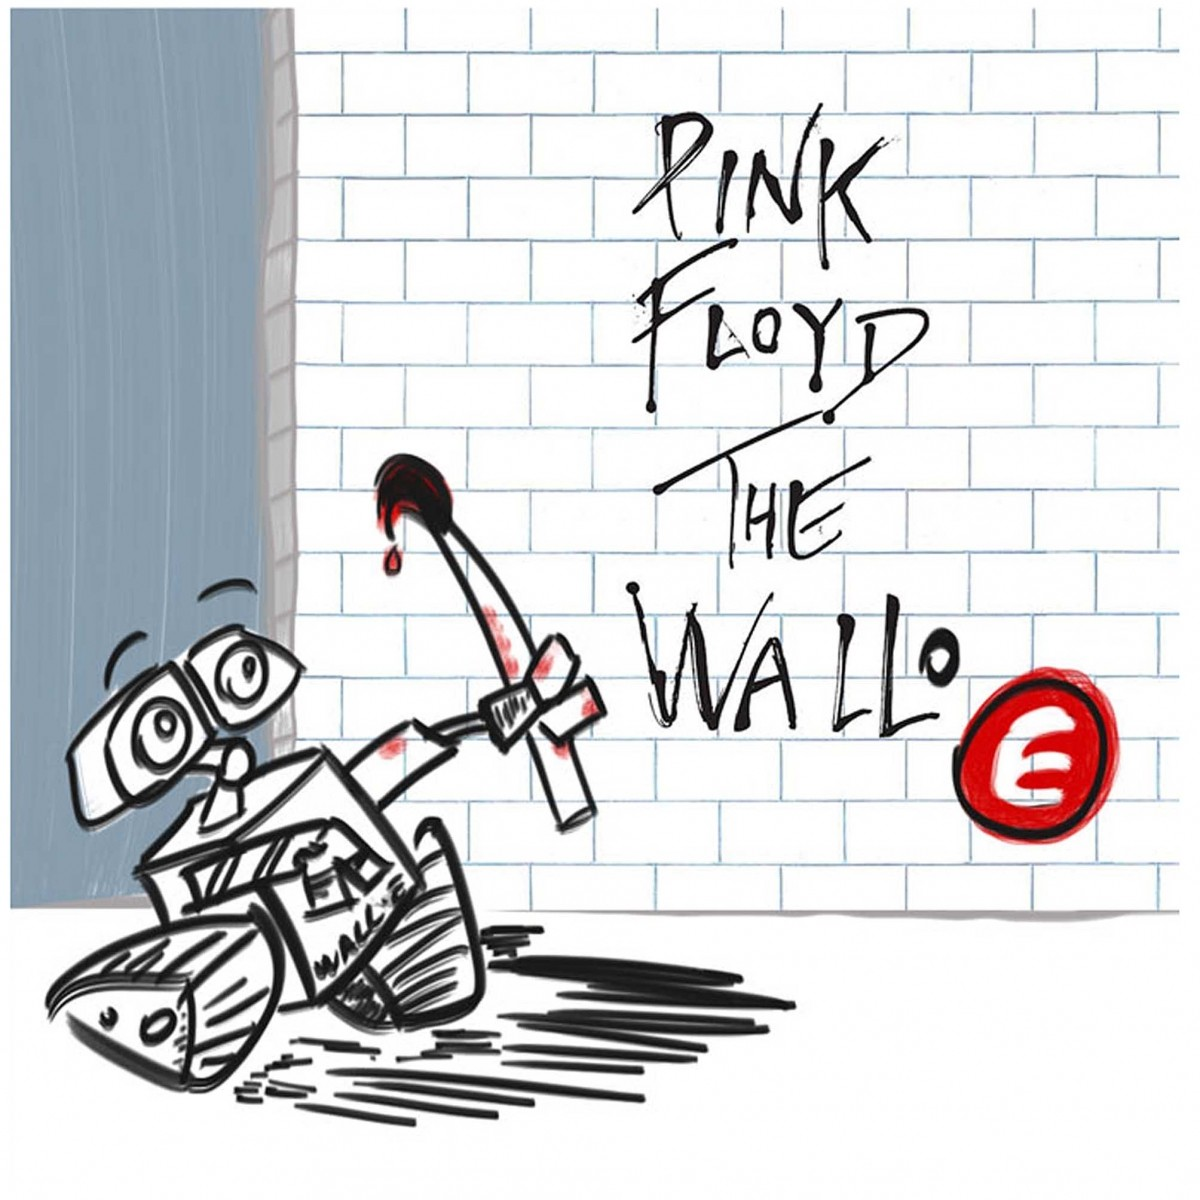 Camiseta  Bebê Rock - The Wall-e Floyd - White  - Baby Monster S/A